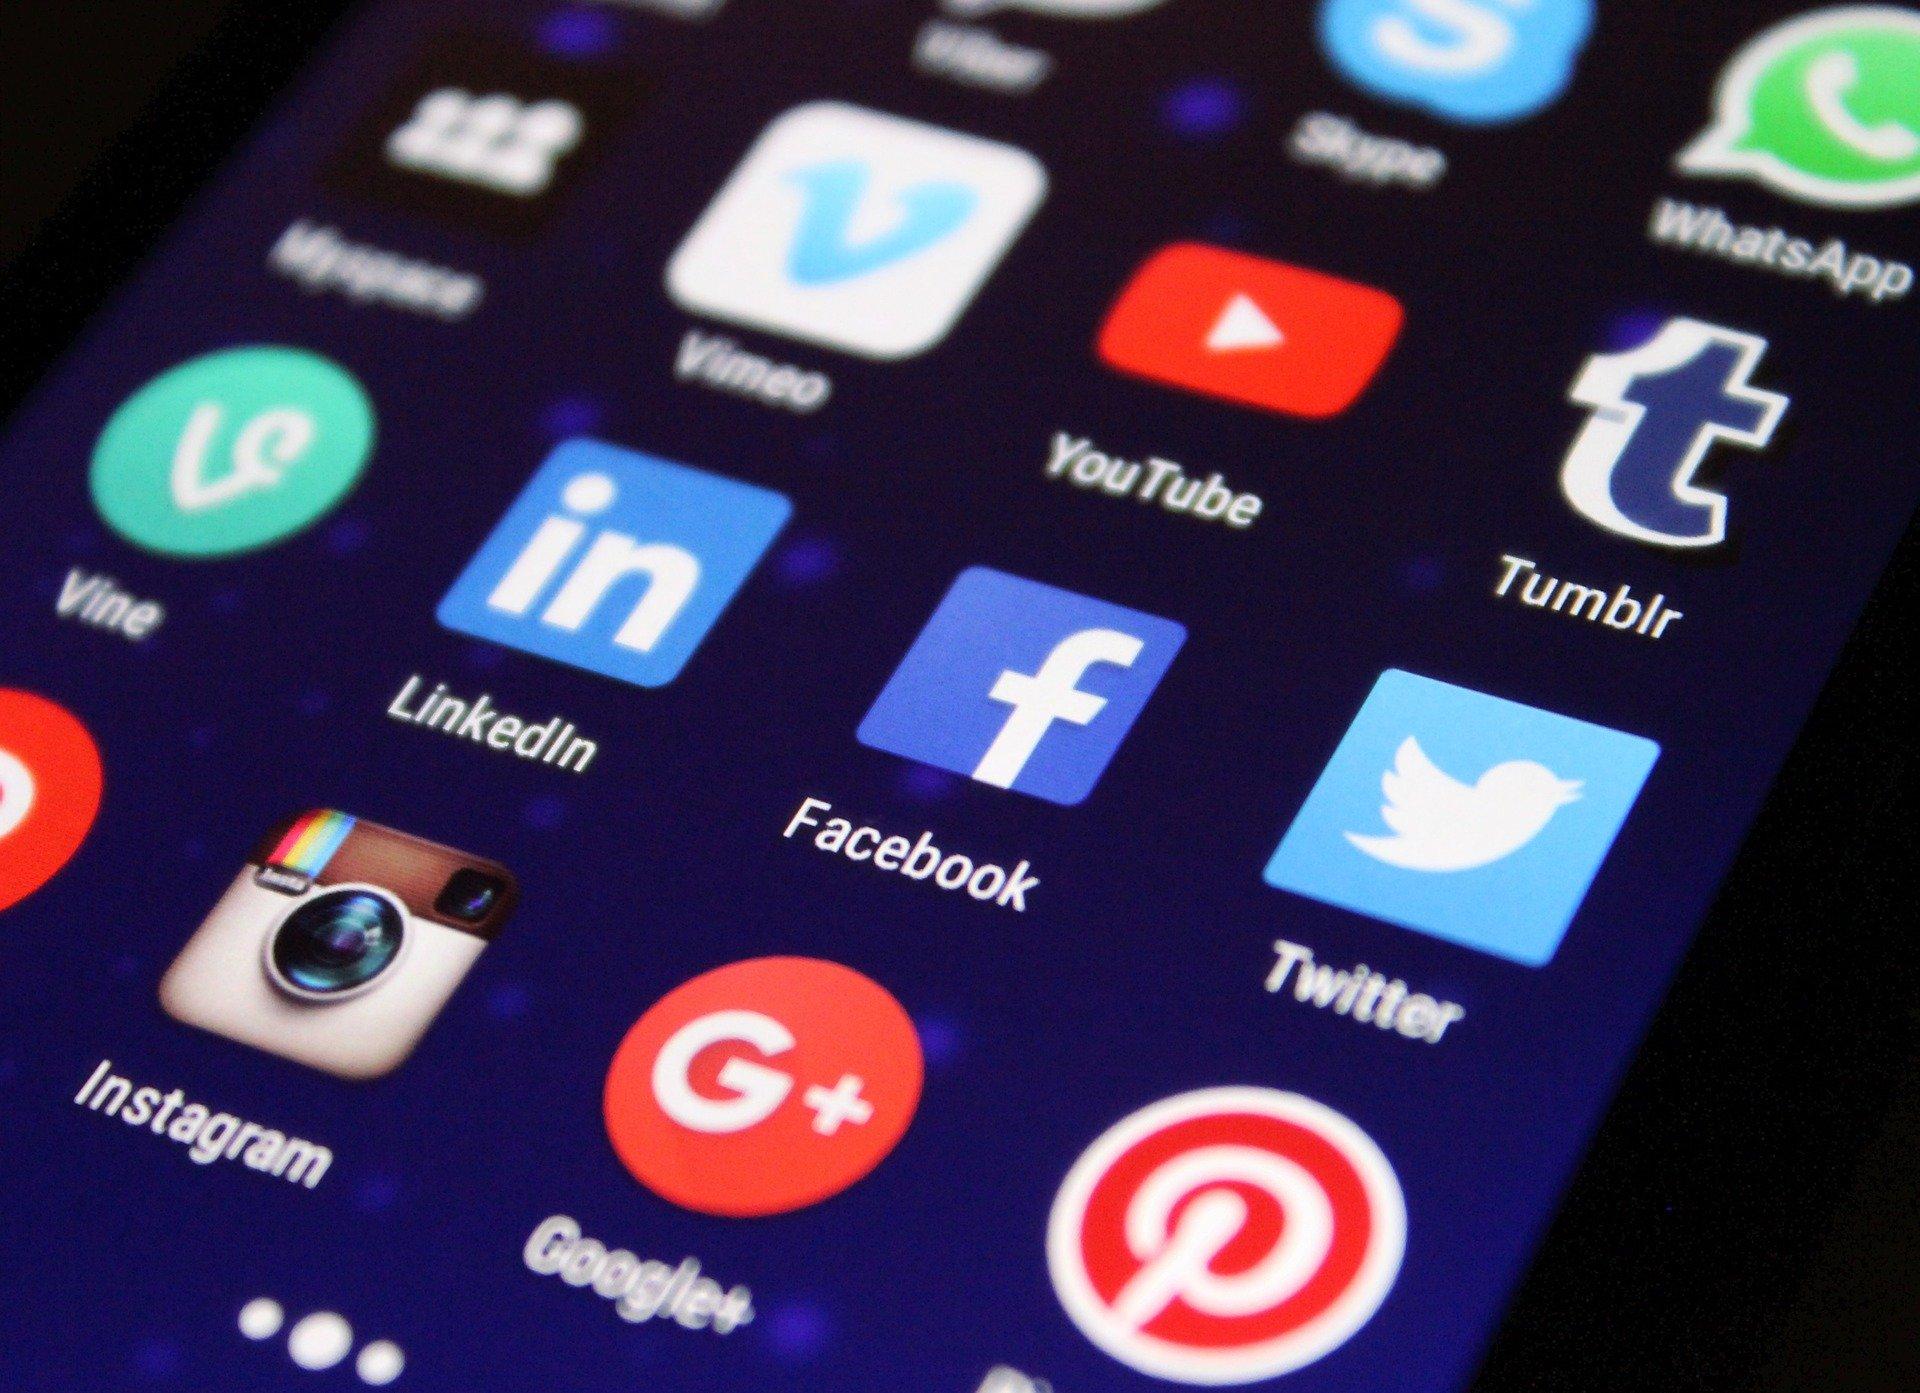 [Presentatie] Gelaagde campagnes: dé strategie voor meer resultaat met social media ads